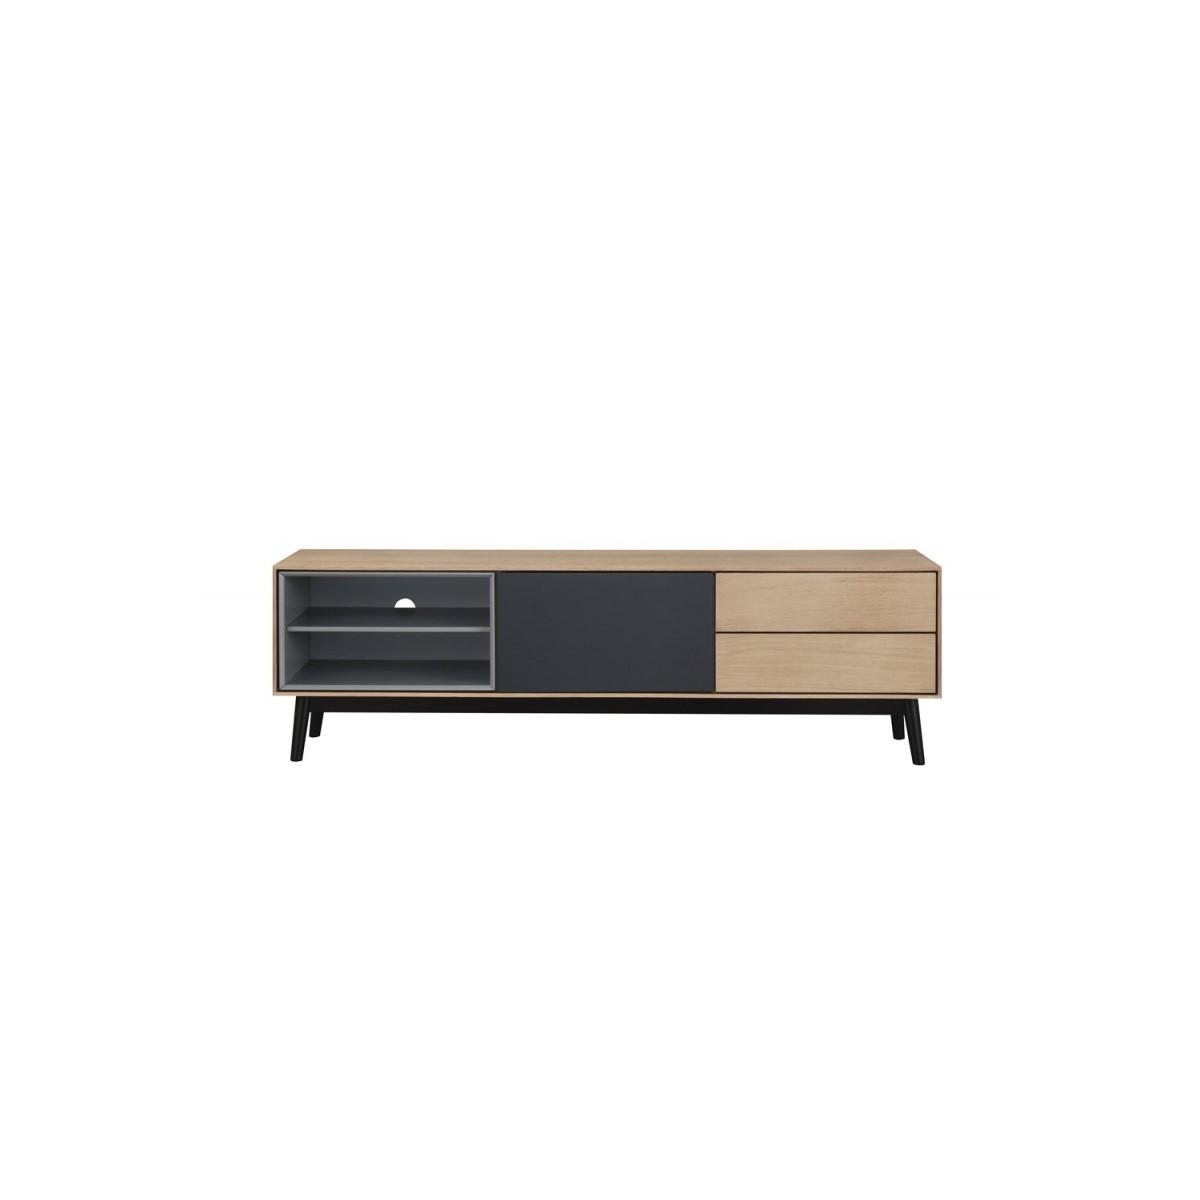 meuble tv bas design 2 niches 1 porte 2 tiroirs adamo en bois chene clair amp story 5441